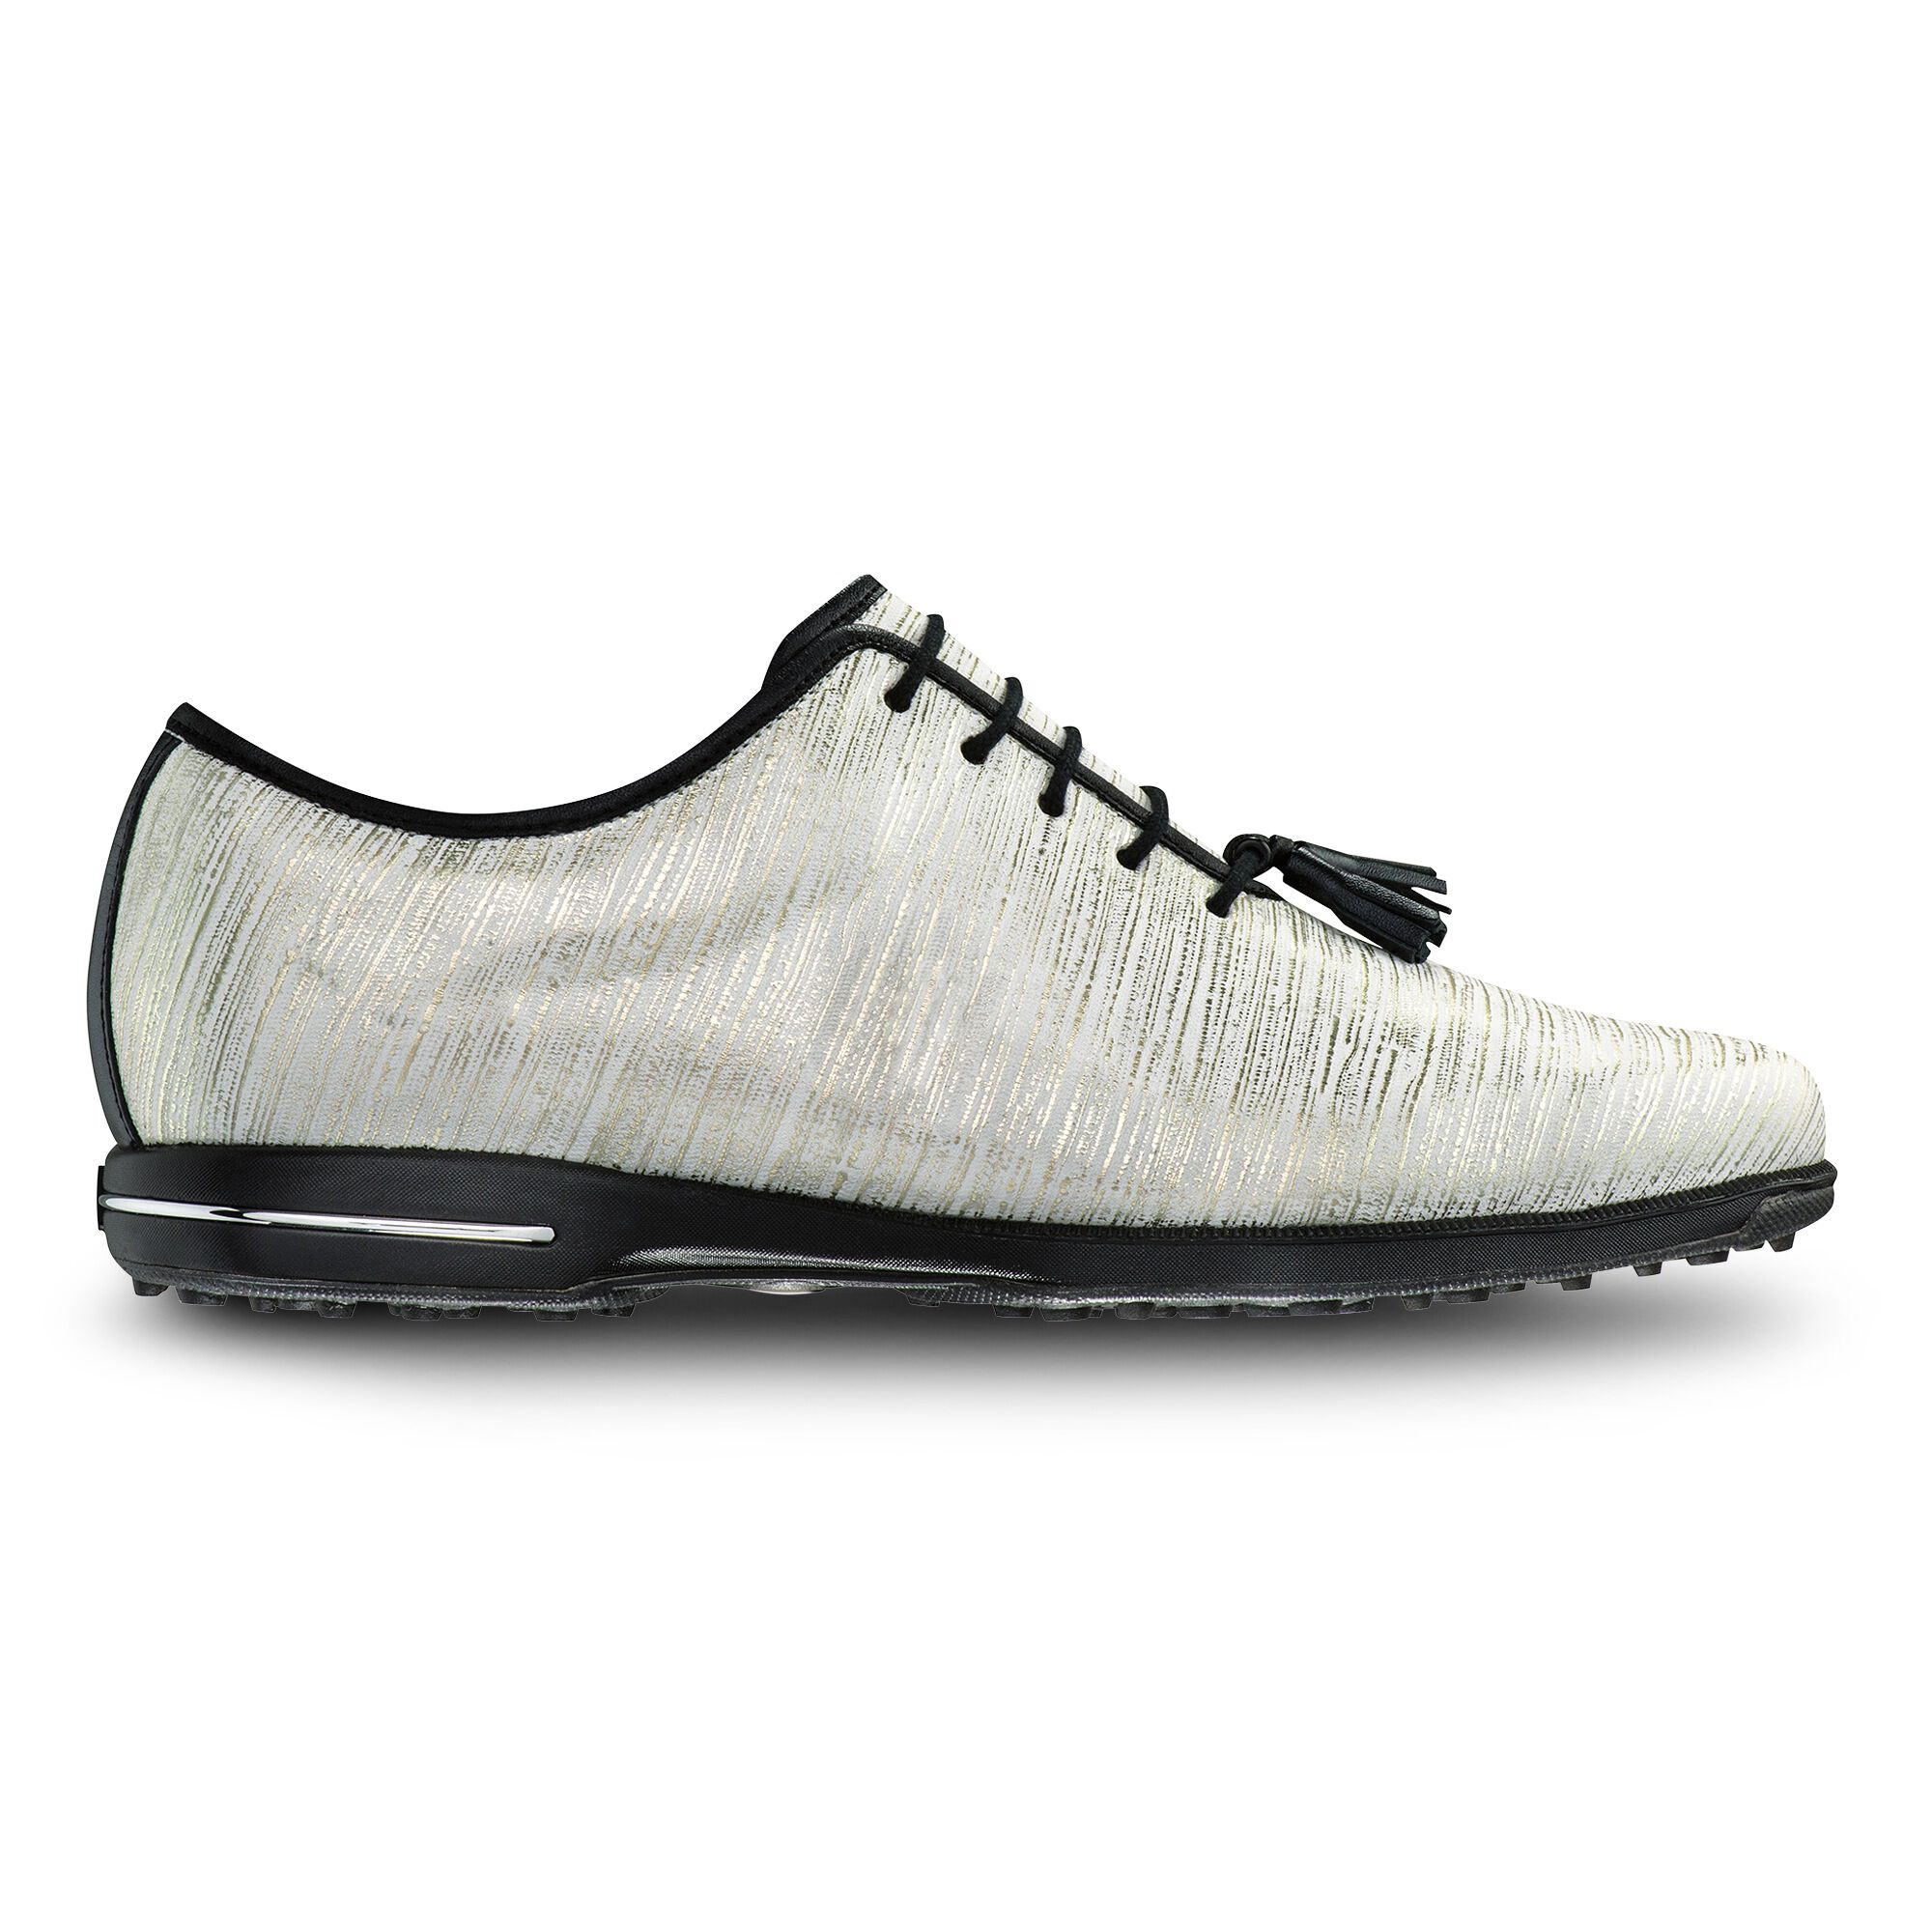 reebok golf shoes